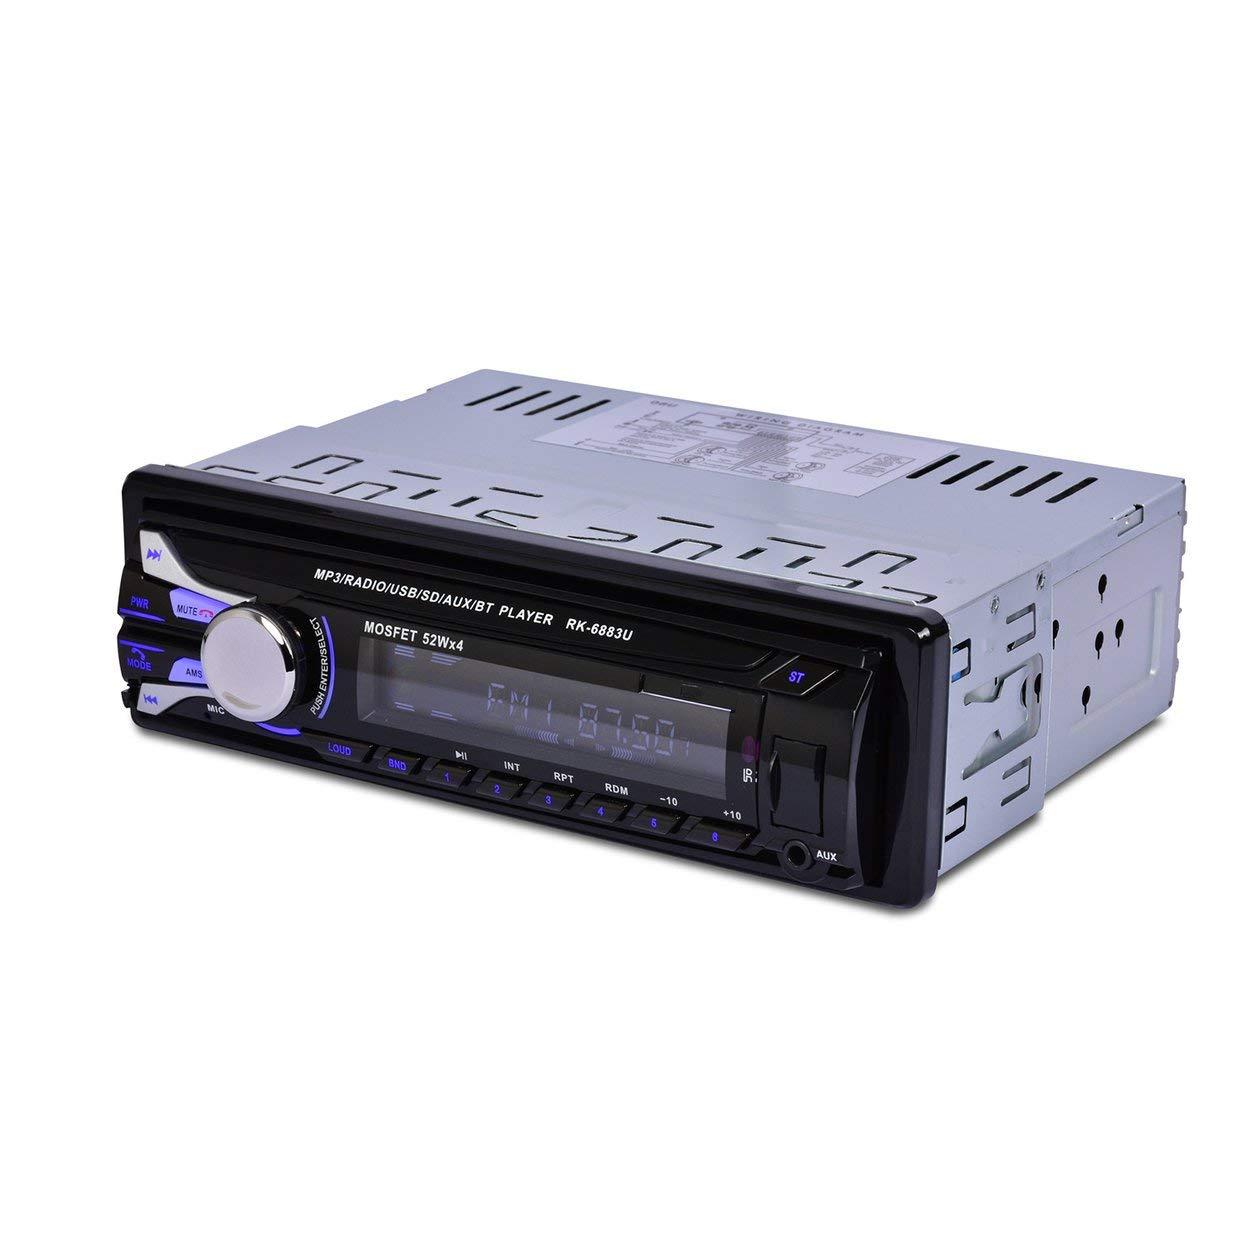 Lorenlli Fit RK-6883U Car SD Card Reader USB 2.0 Car MP3 Player With Bluetooth Detachable Panel FM Tuner Aux In Remote Control